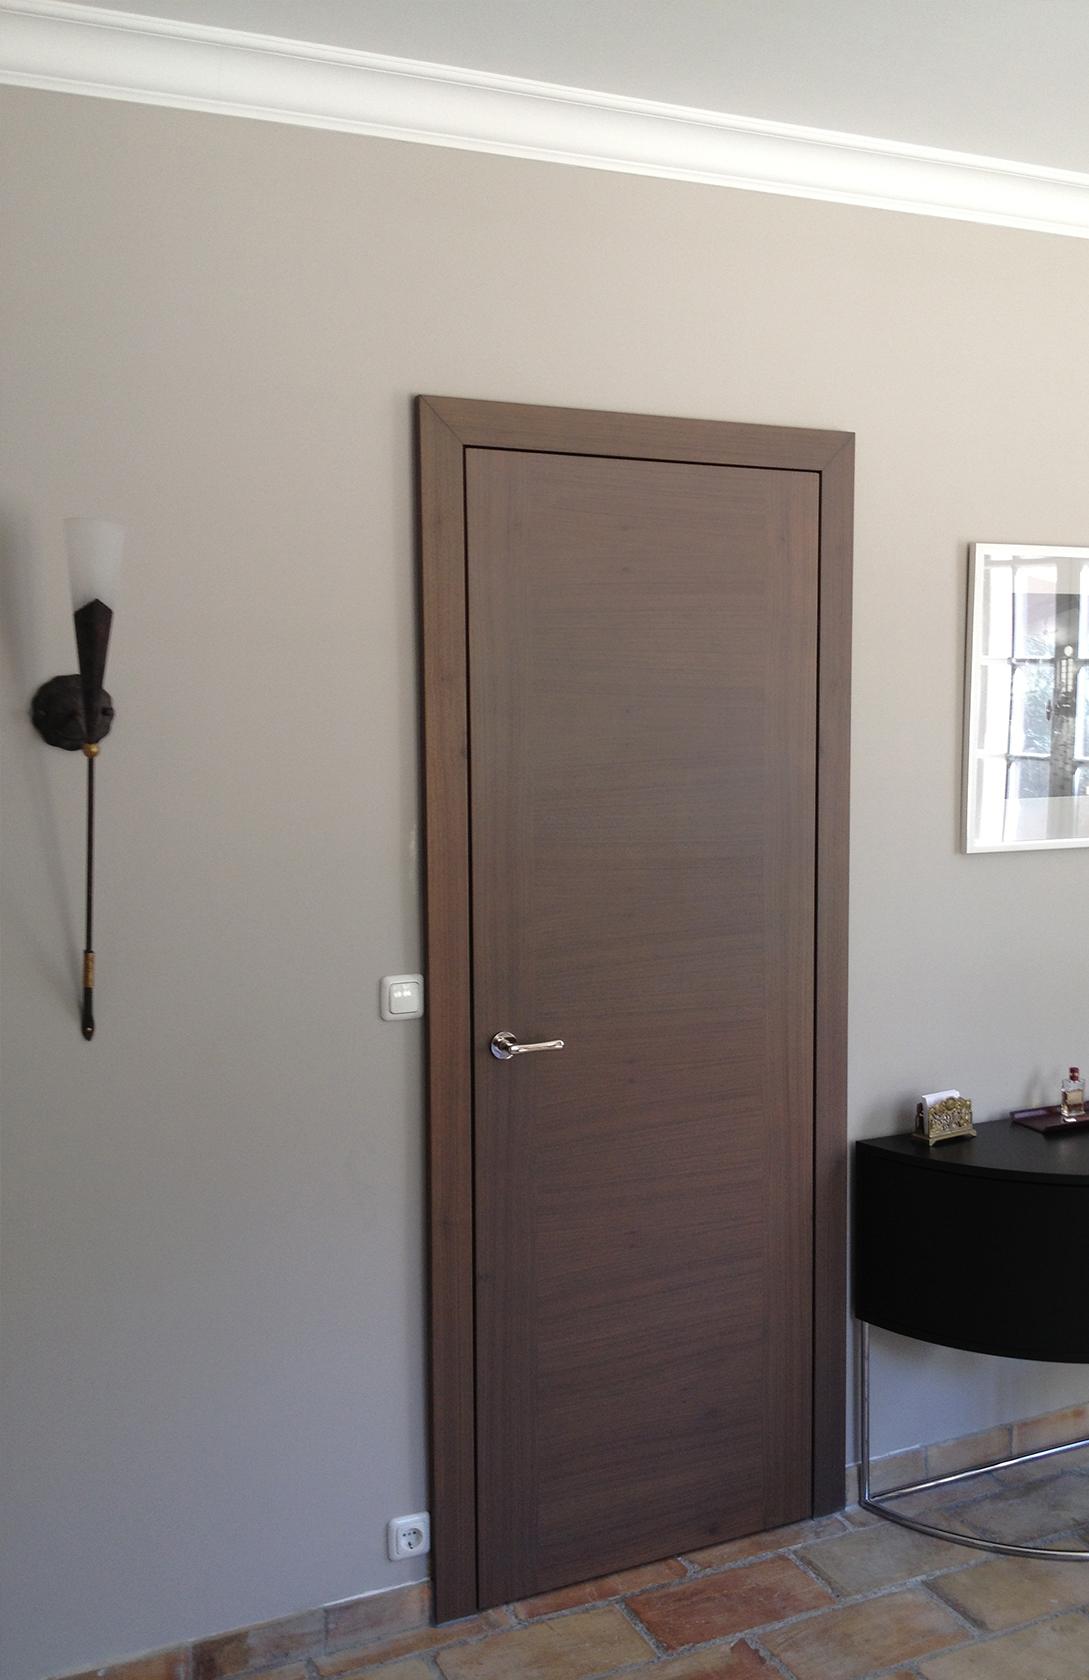 Türen 3 Steck 6 Müller Möbelbau